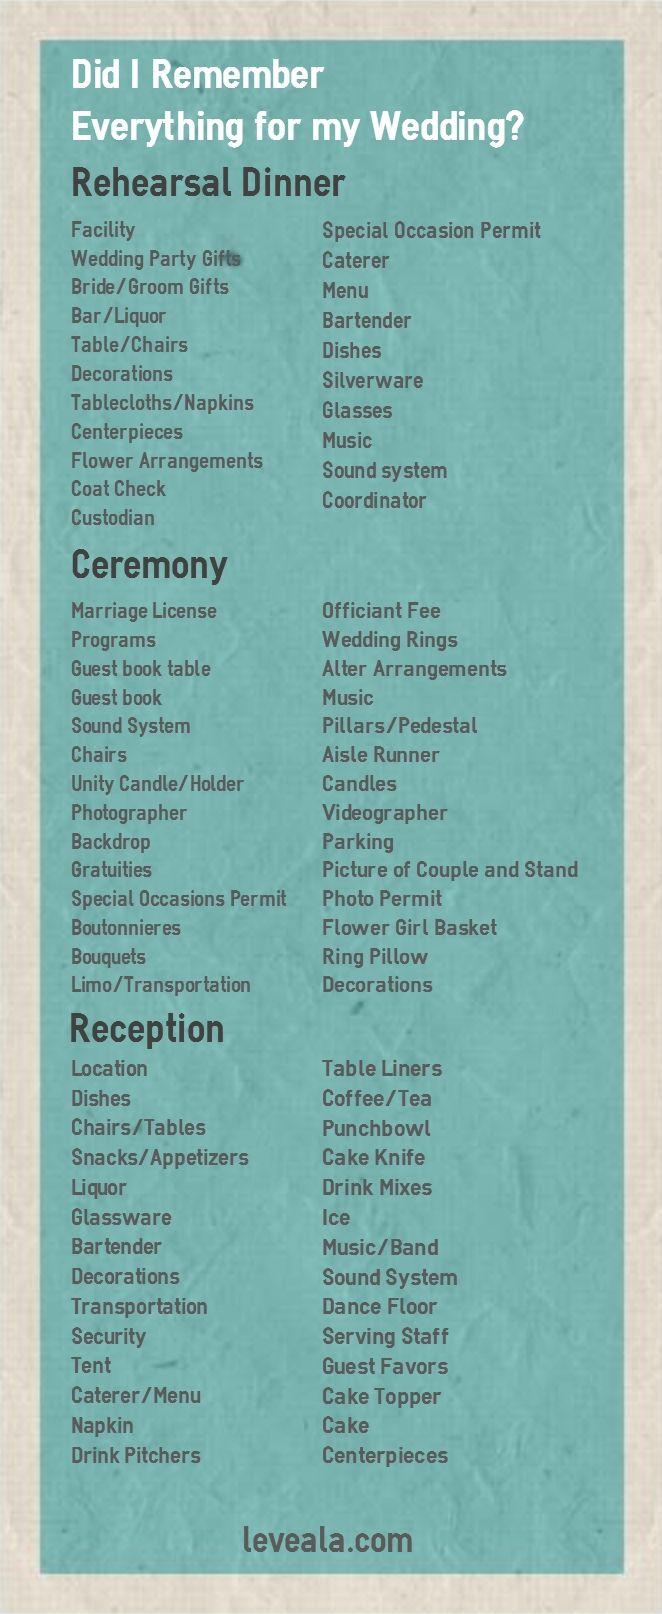 Did I Remember Everything for My Wedding? Wedding Checklist